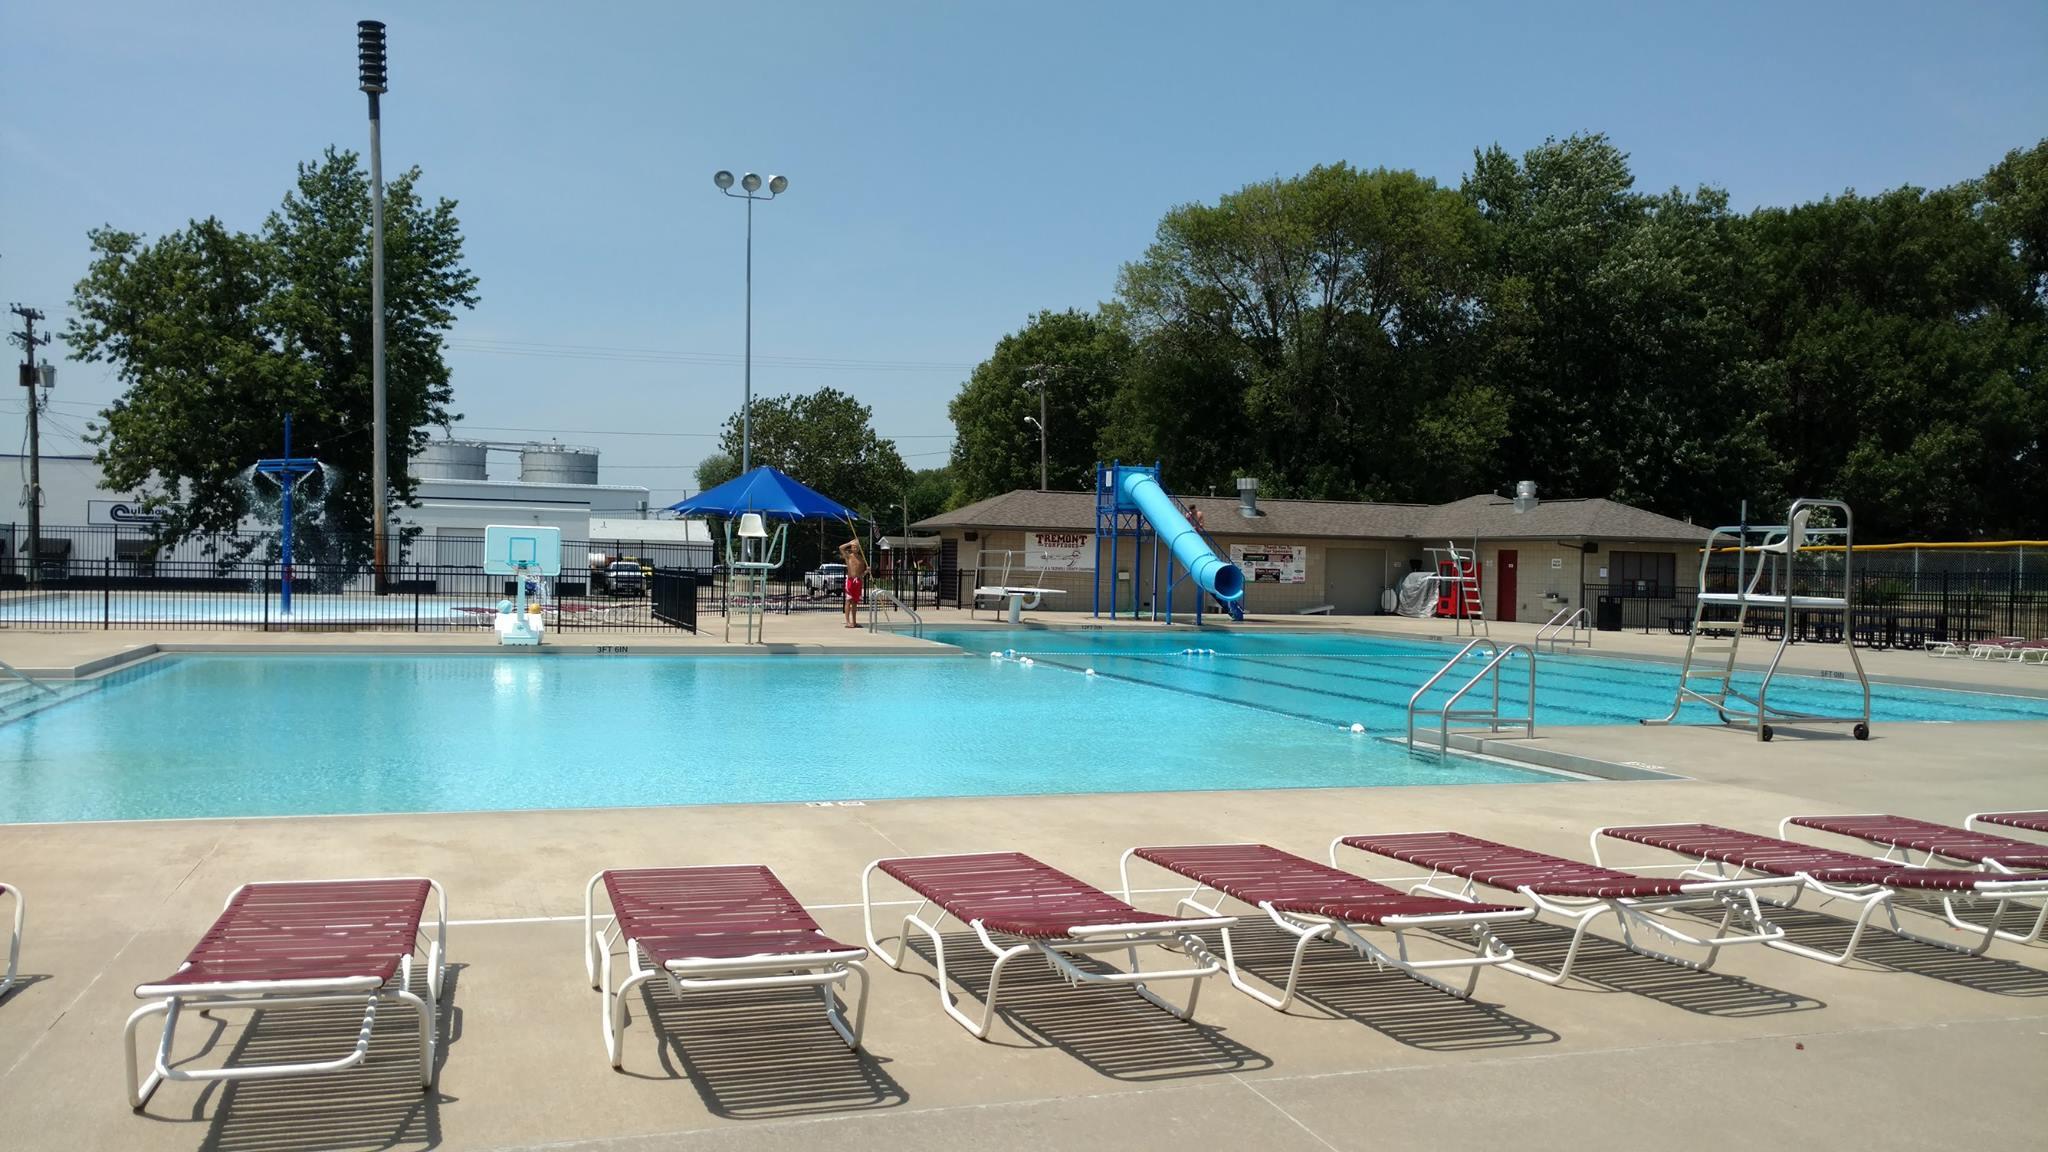 Tremont Community pool